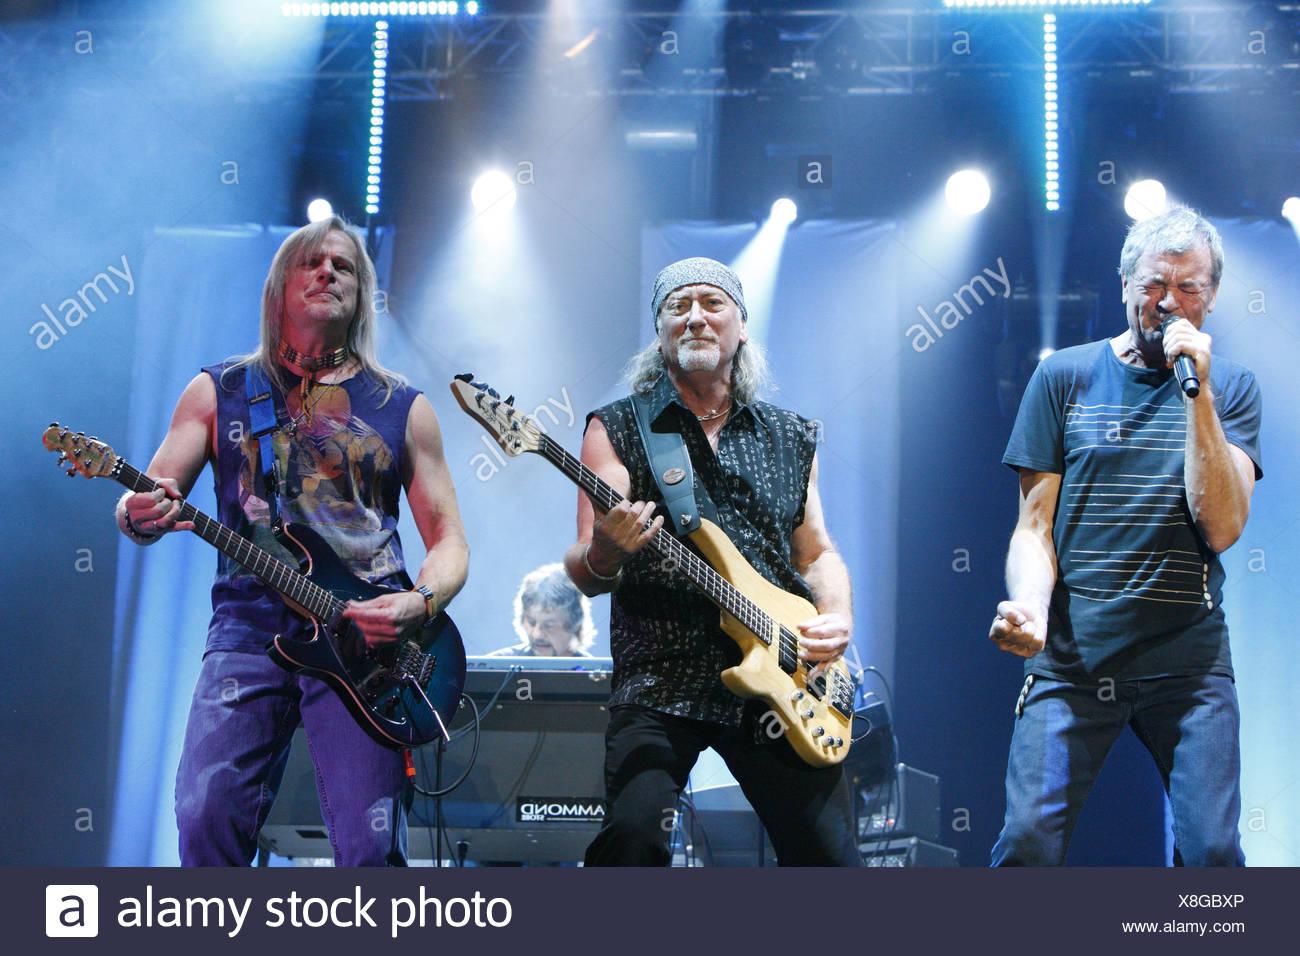 Ian Gillan, Roger Glover, Steve Morse, Deep Purple, English rock band, Open Air Festival, Muehldorf am Inn, Bavaria, Germany - Stock Image